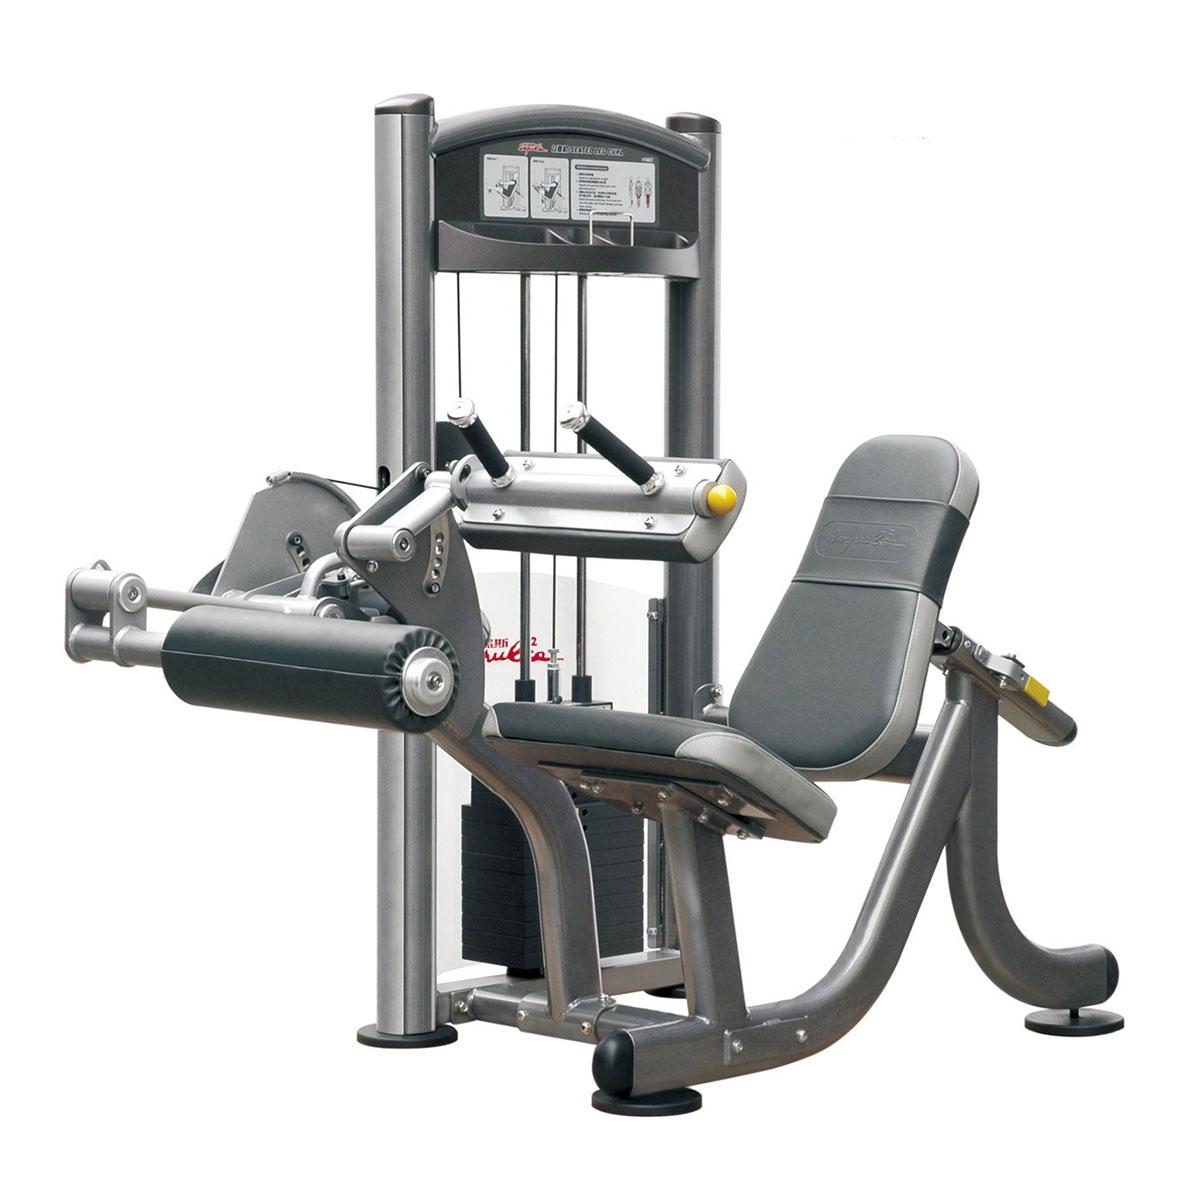 Seated Leg Curl c/ ajustes - 200 lbs